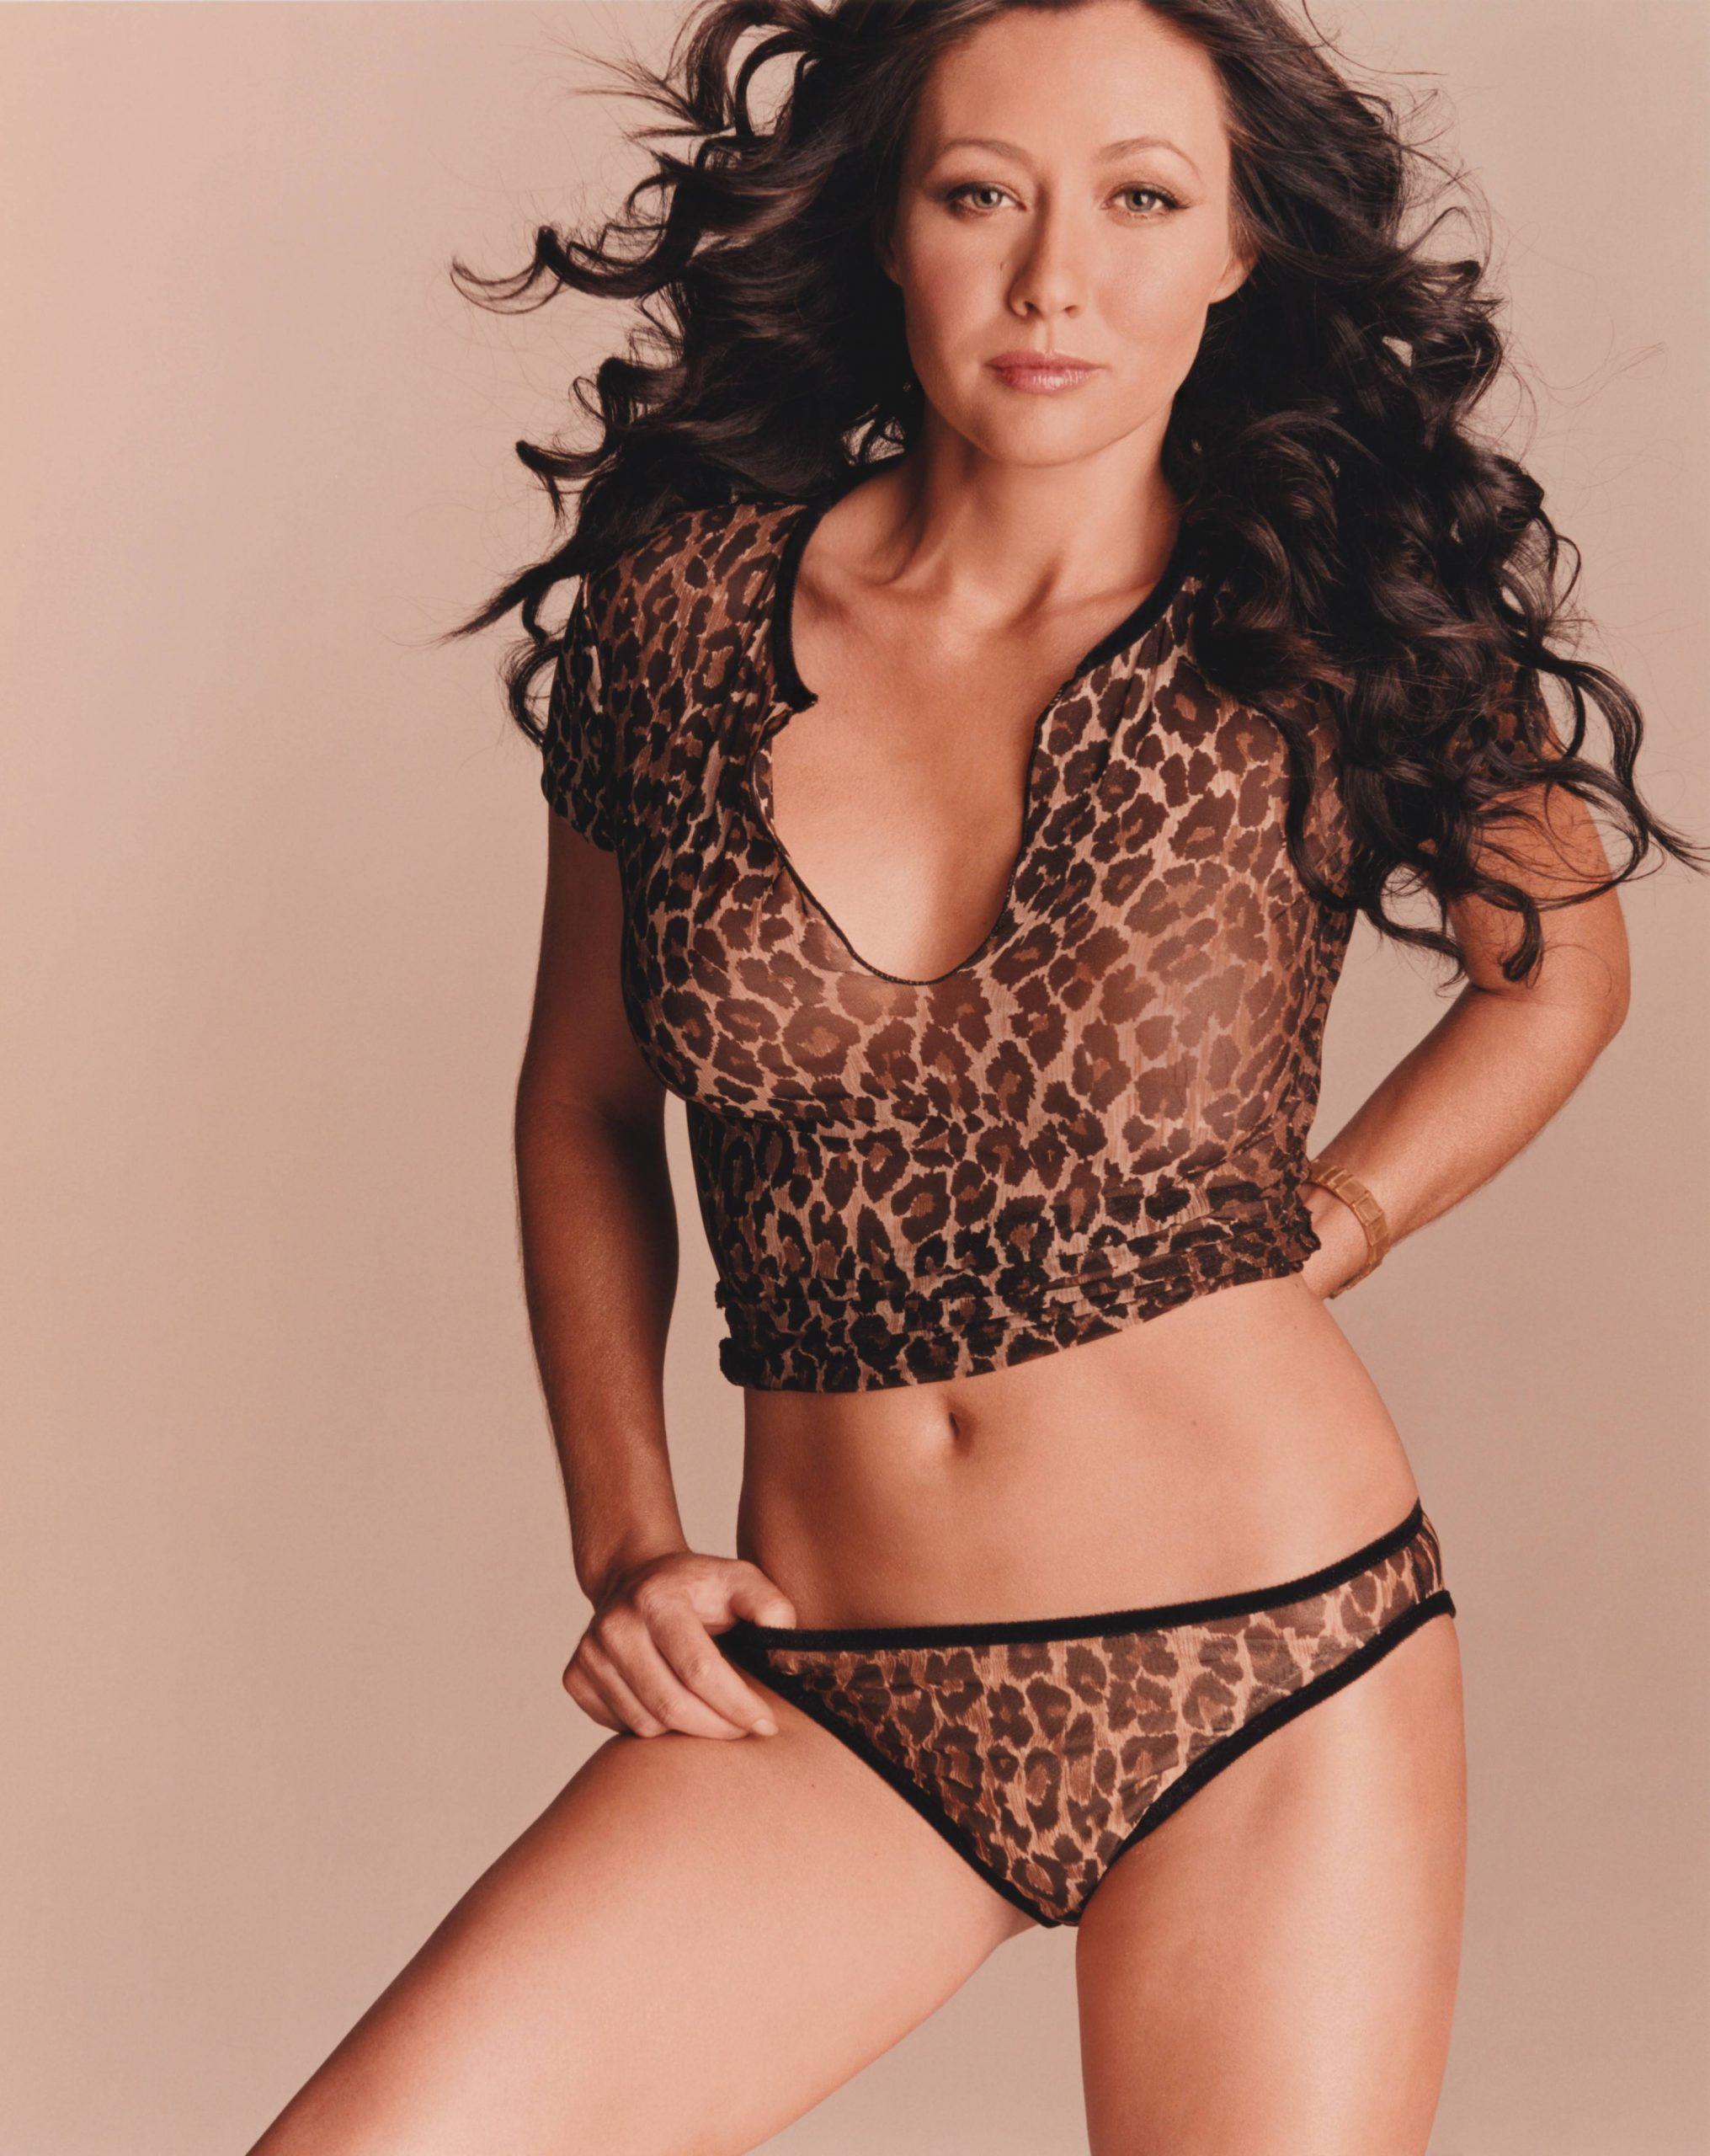 Shannen Doherty sexy bikini pics